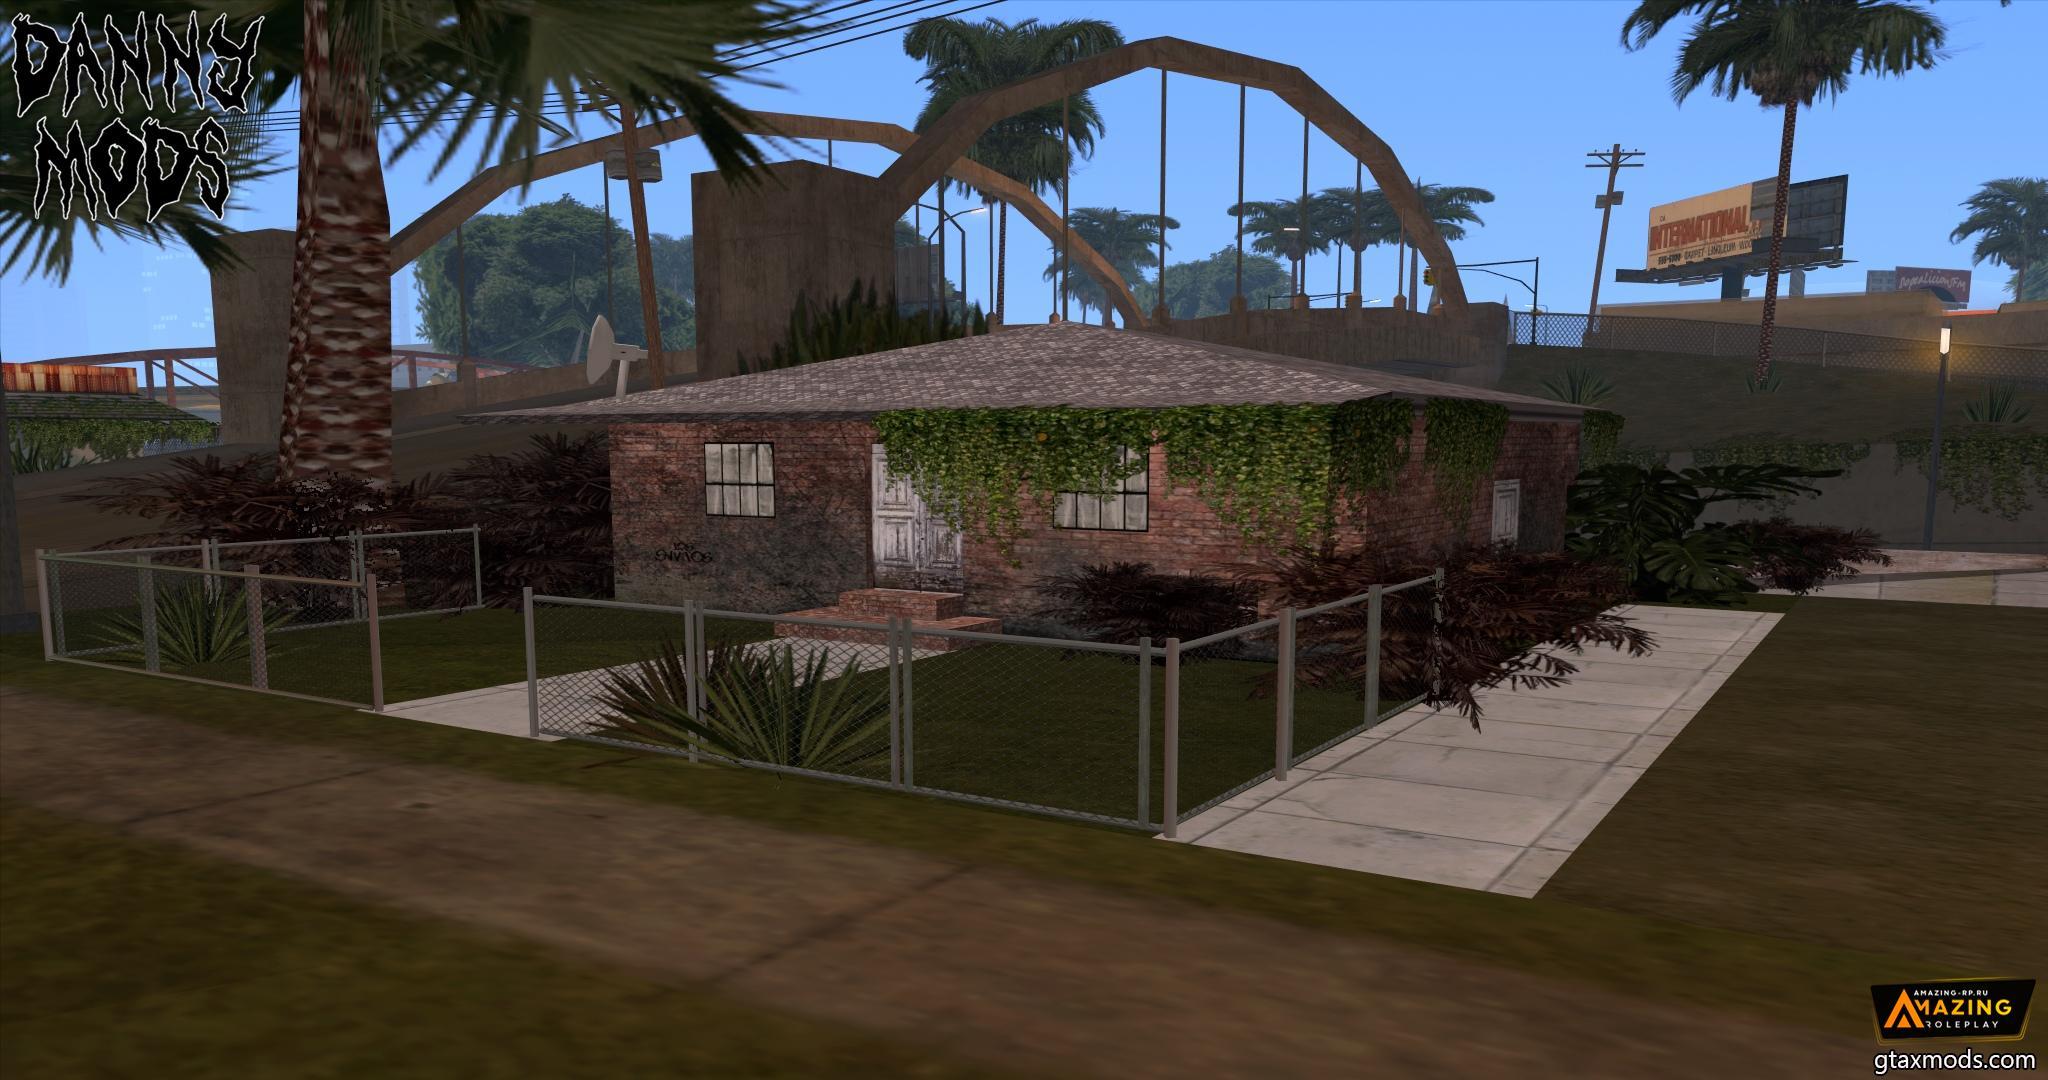 HOUSE RETEXTURE | DANNY MODS